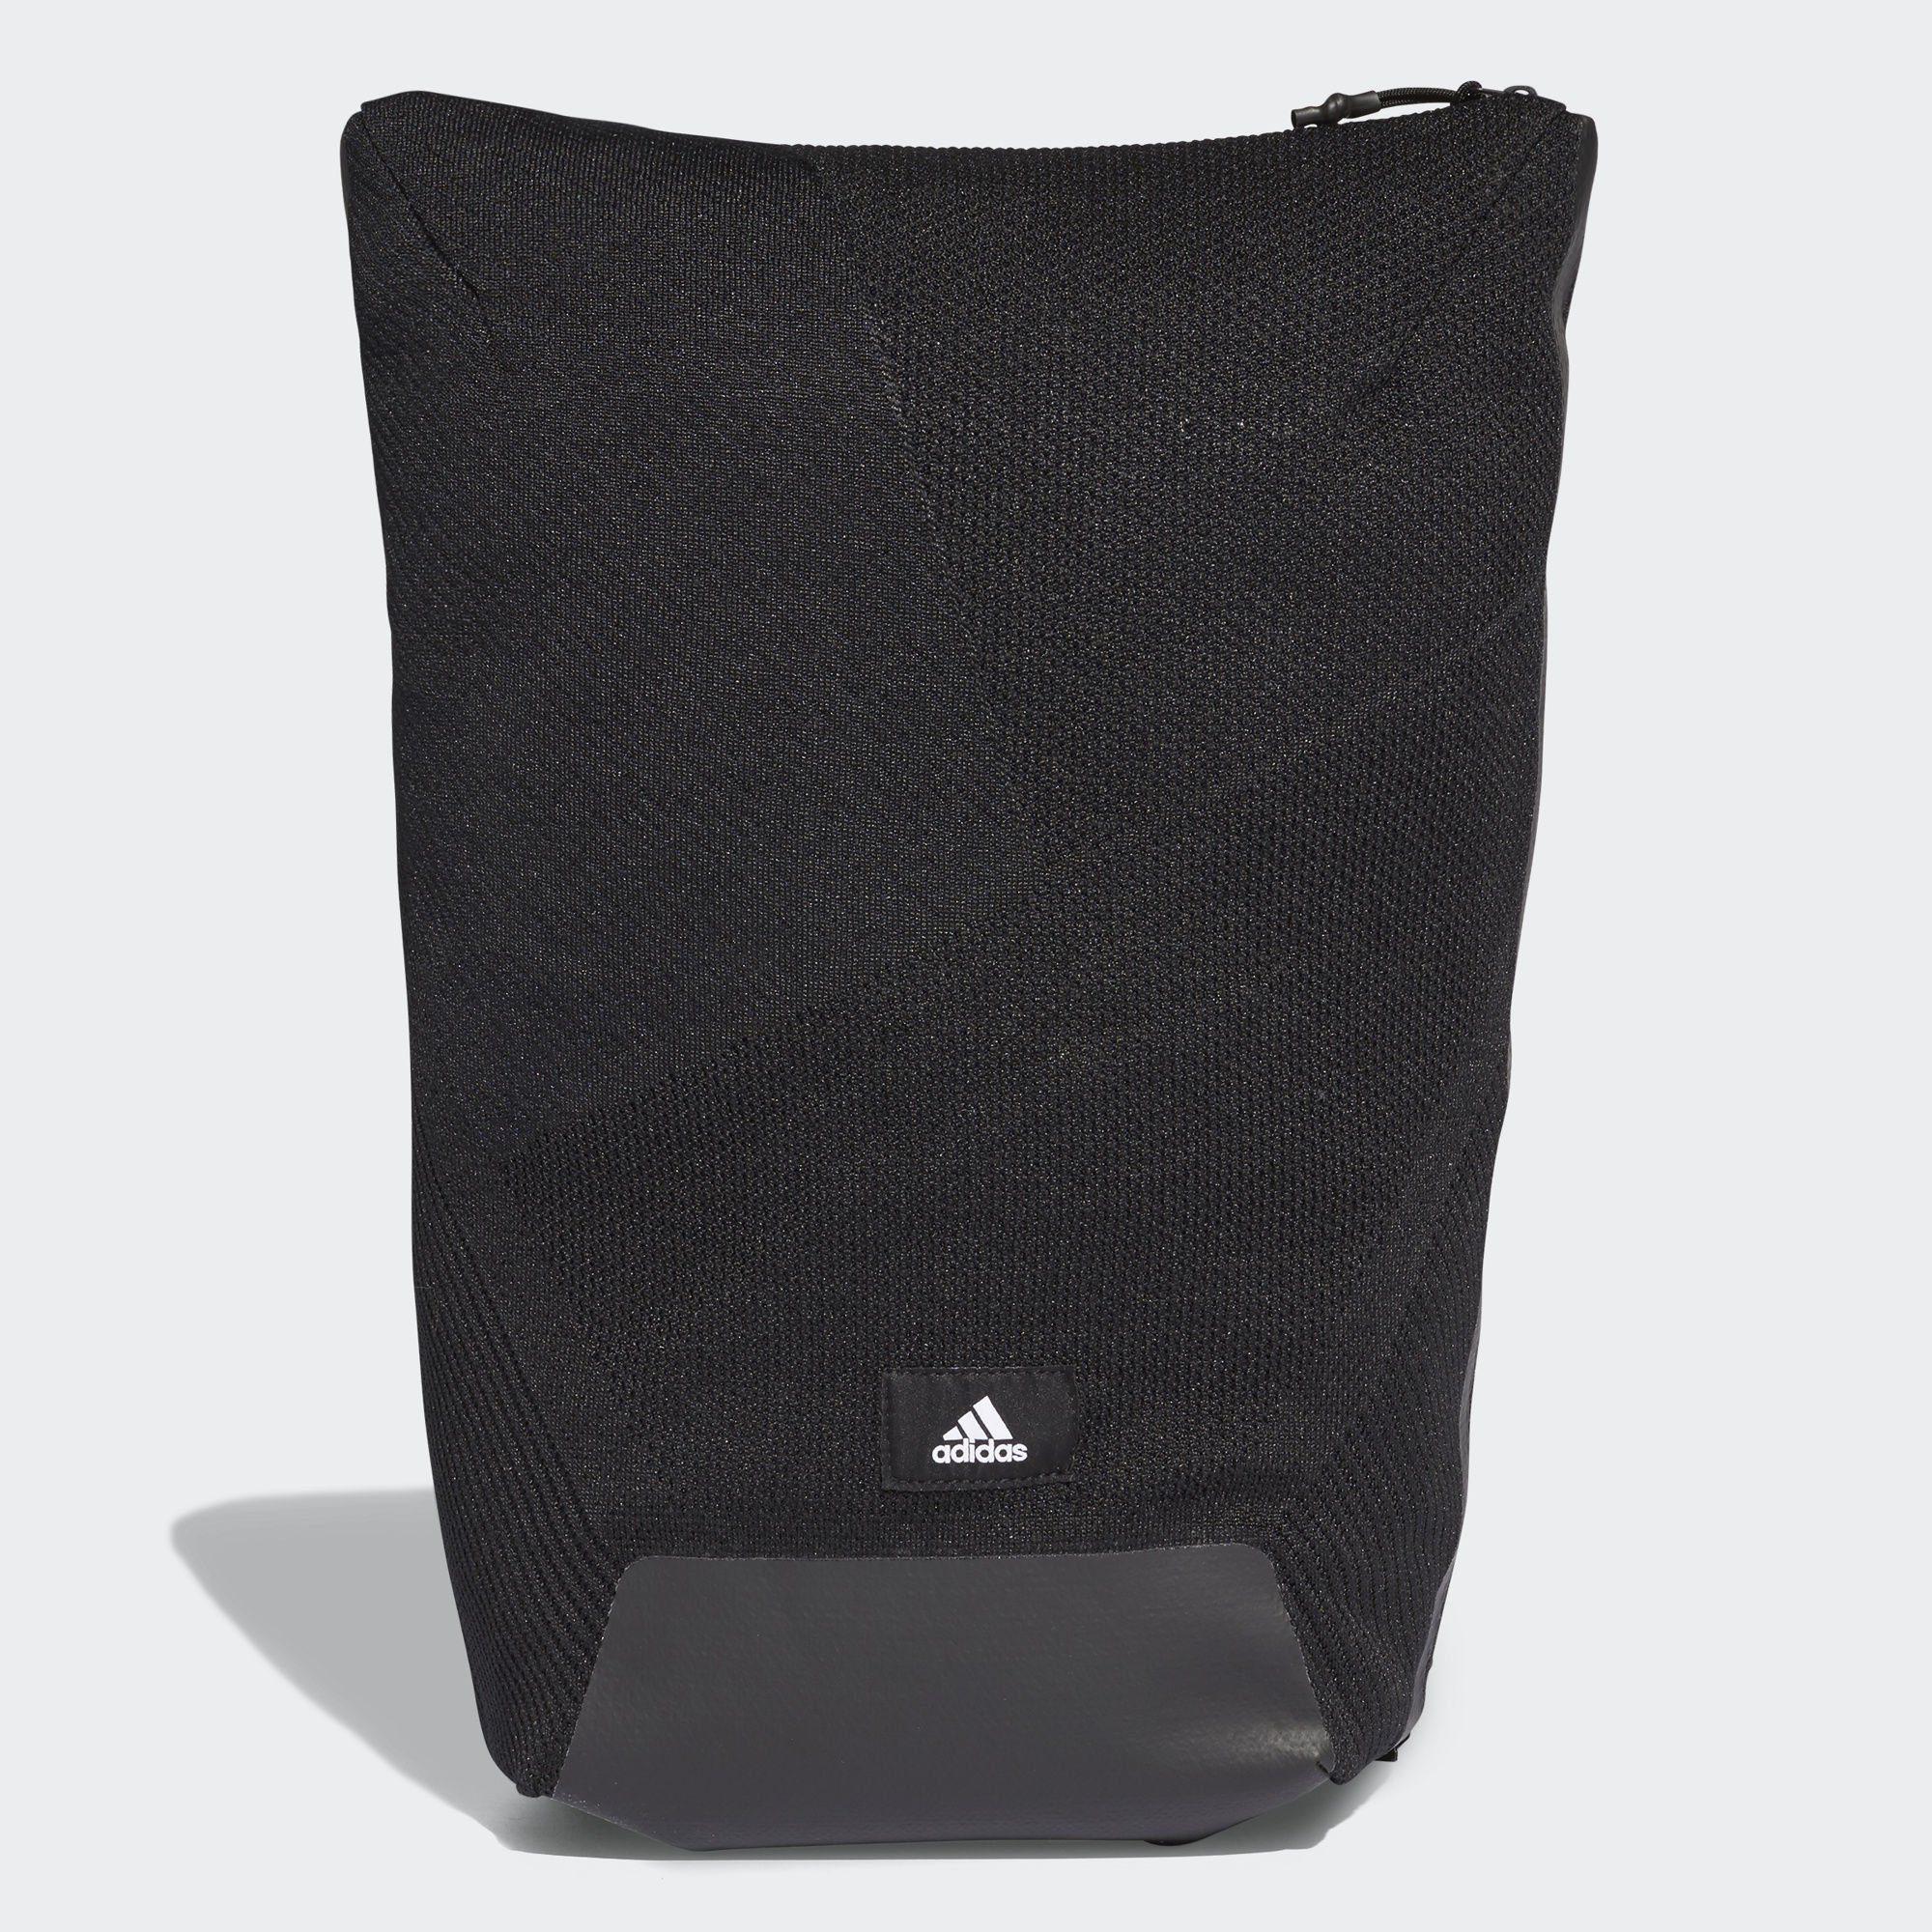 adidas Performance Sporttasche »adidas Z.N.E. Parley Rucksack«